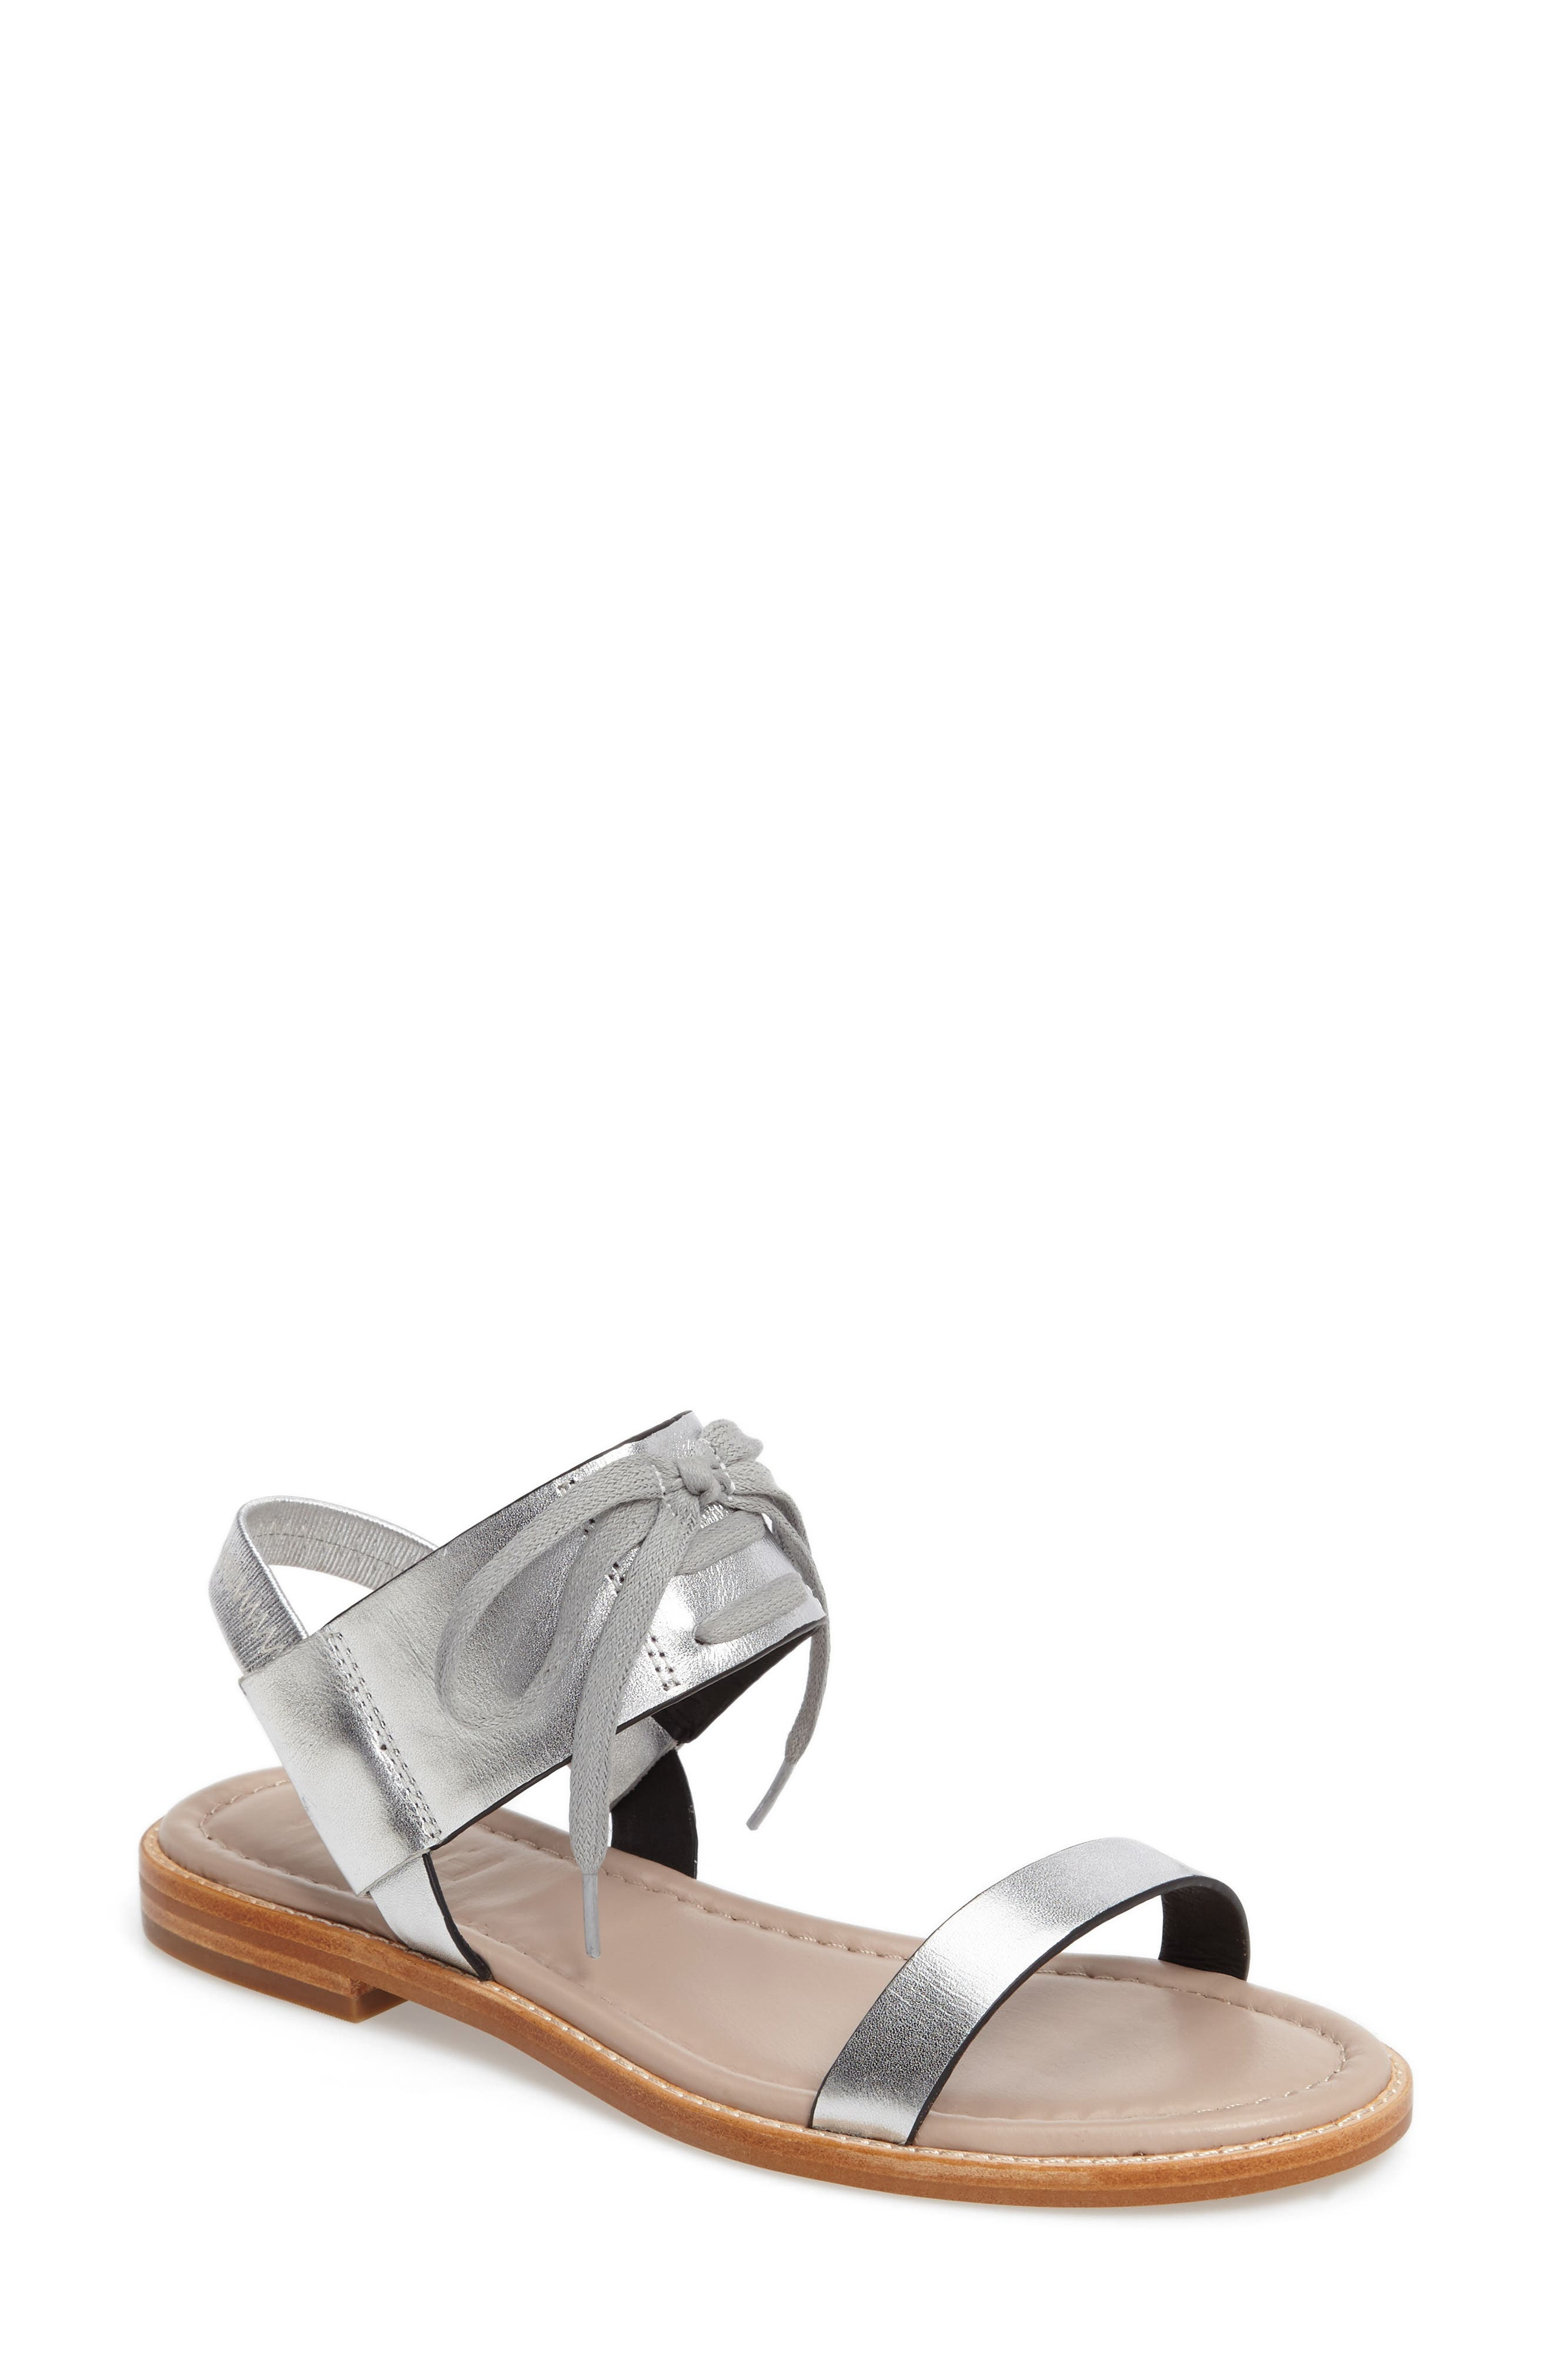 M4D3 Hailey Slingback Sandal,                             Main thumbnail 1, color,                             Silver Leather